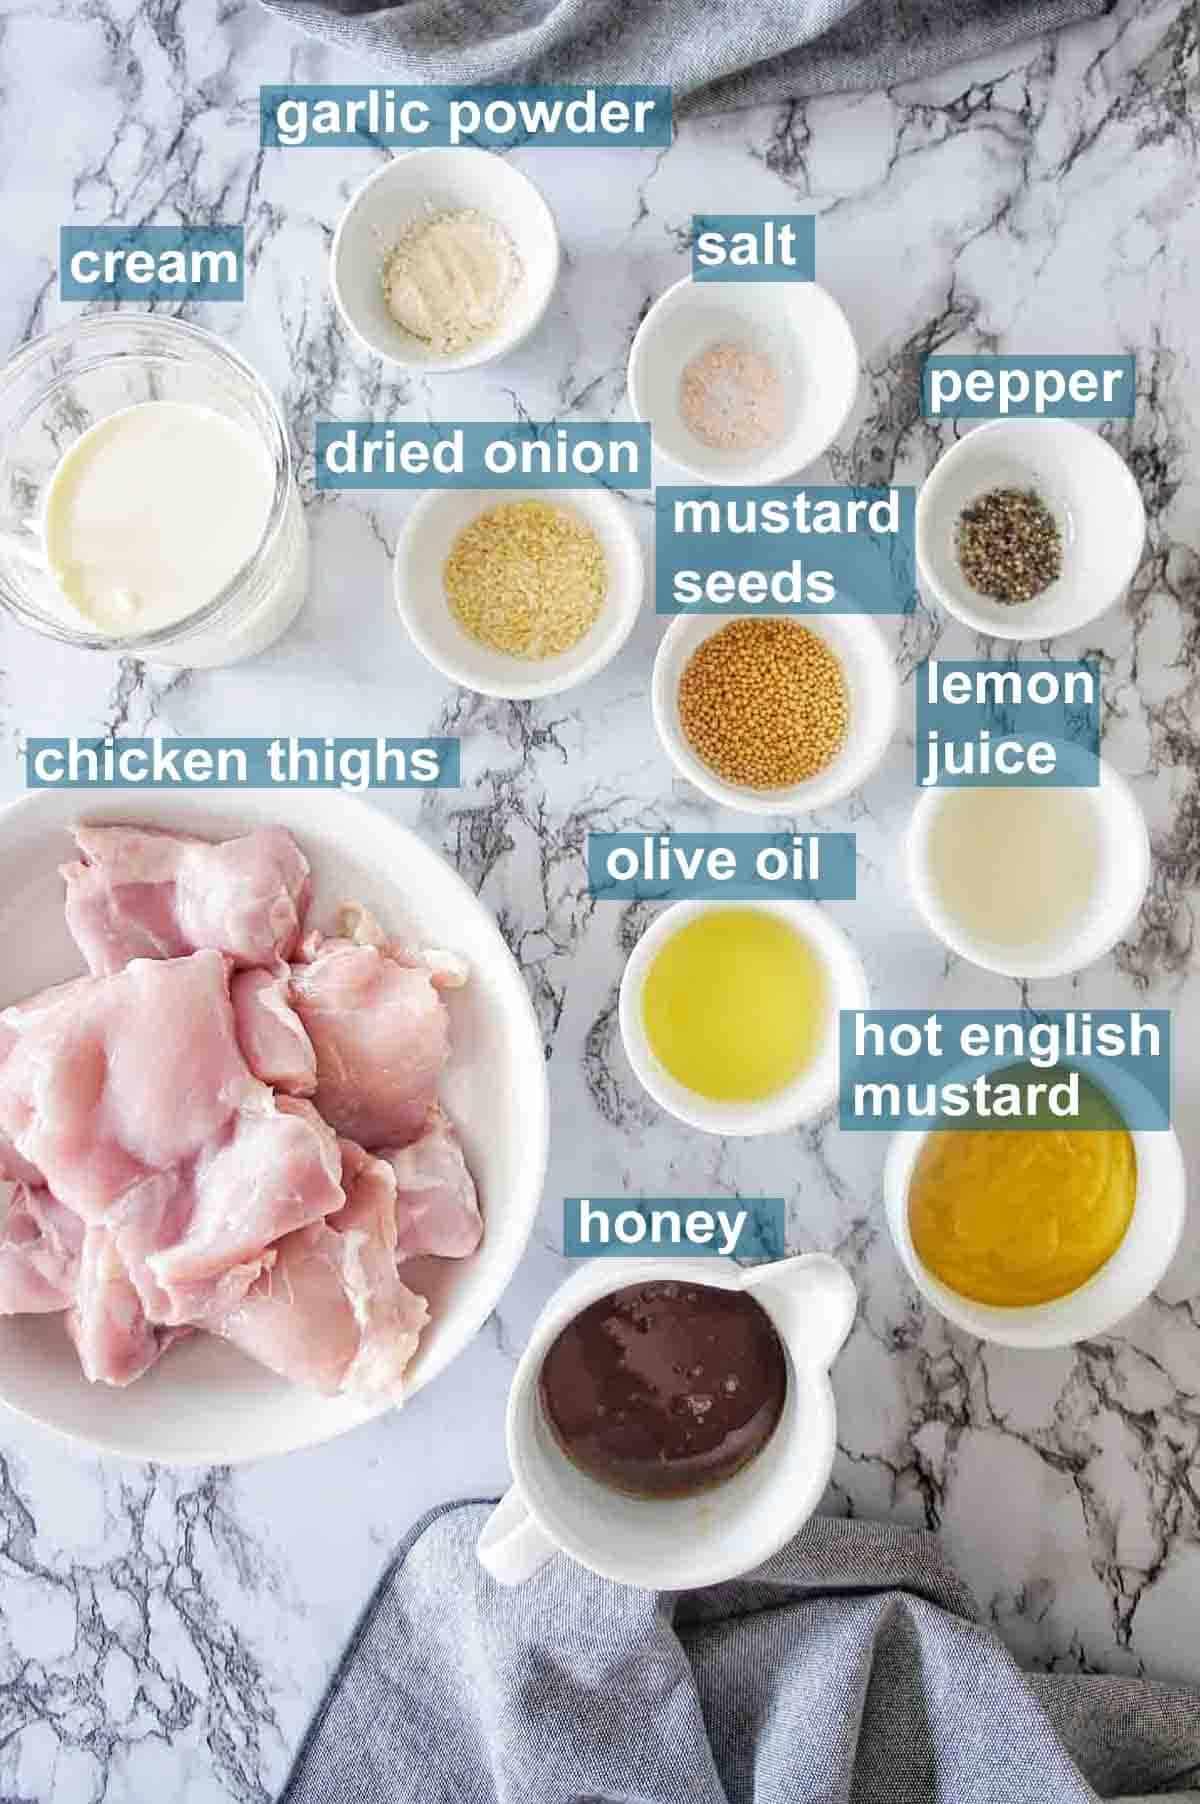 Honey Mustard Chicken Thigh ingredients with text overlay